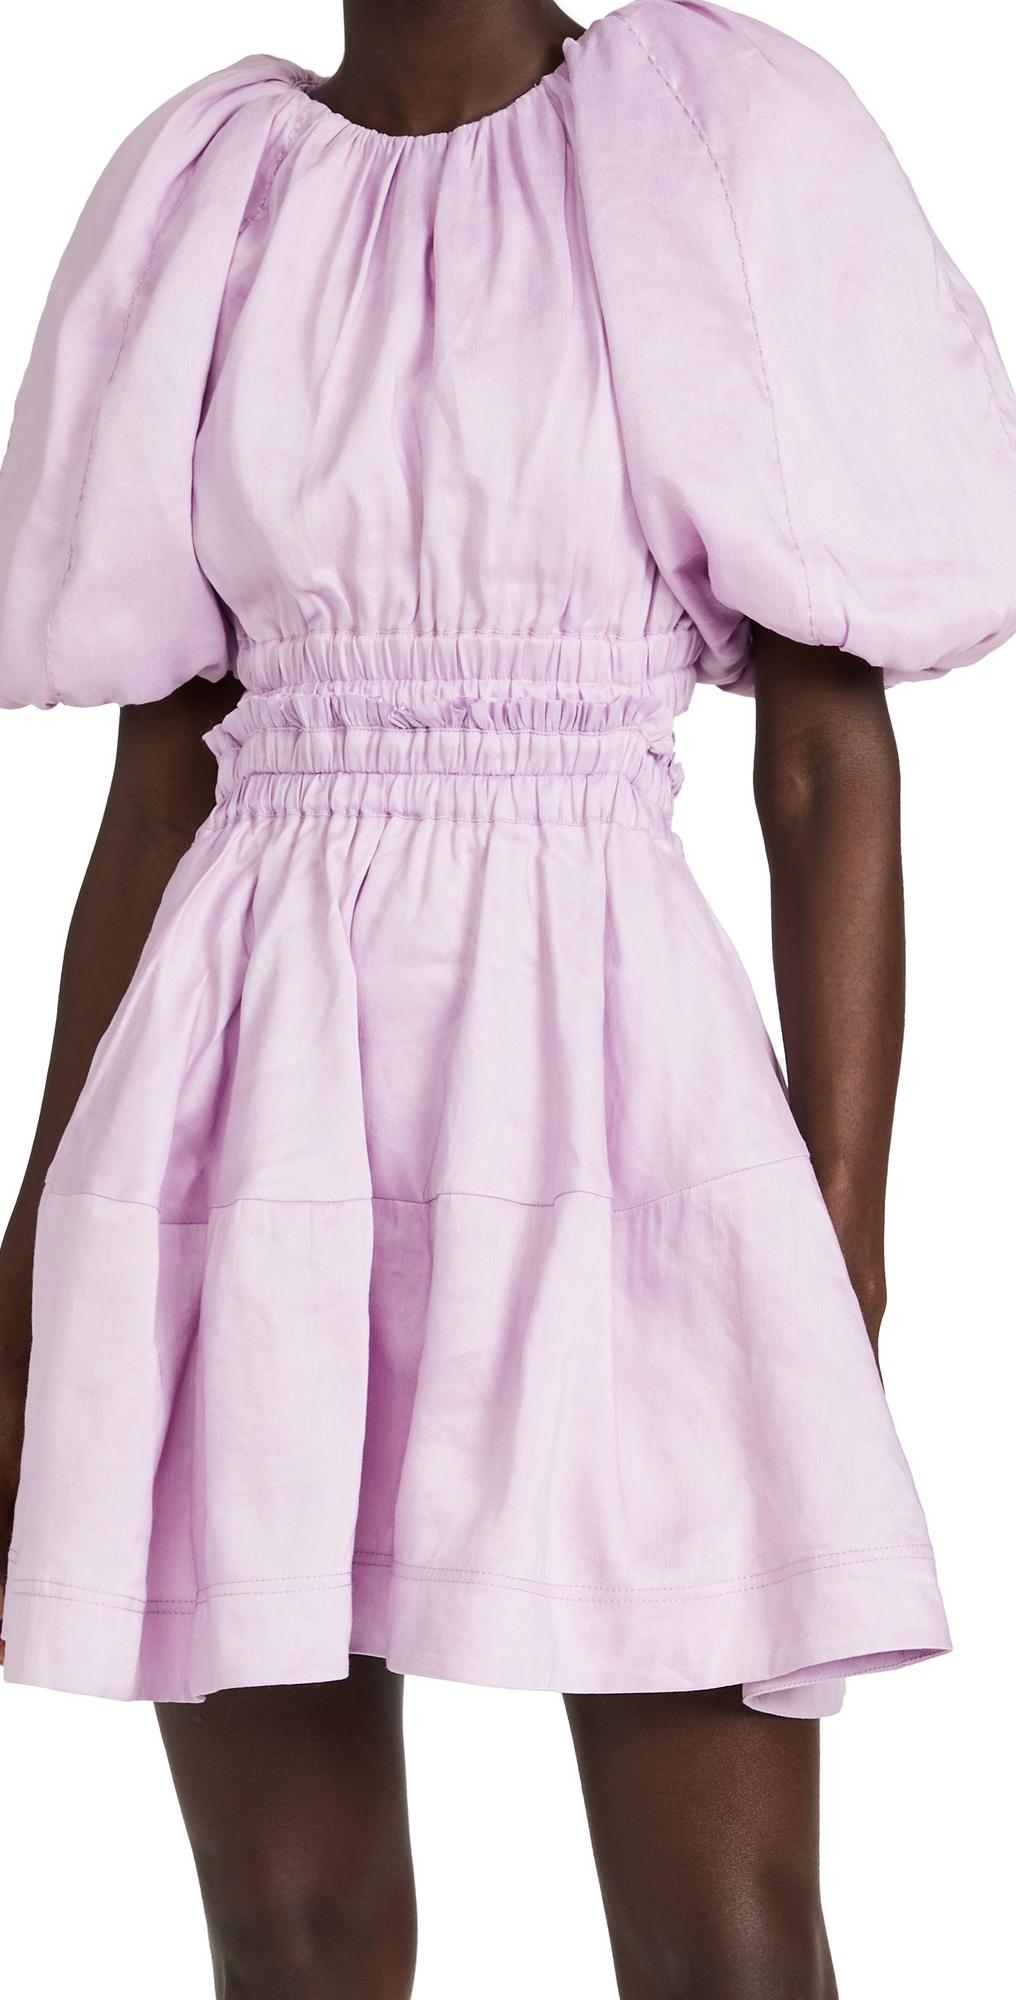 Solitude Cutout Mini Dress